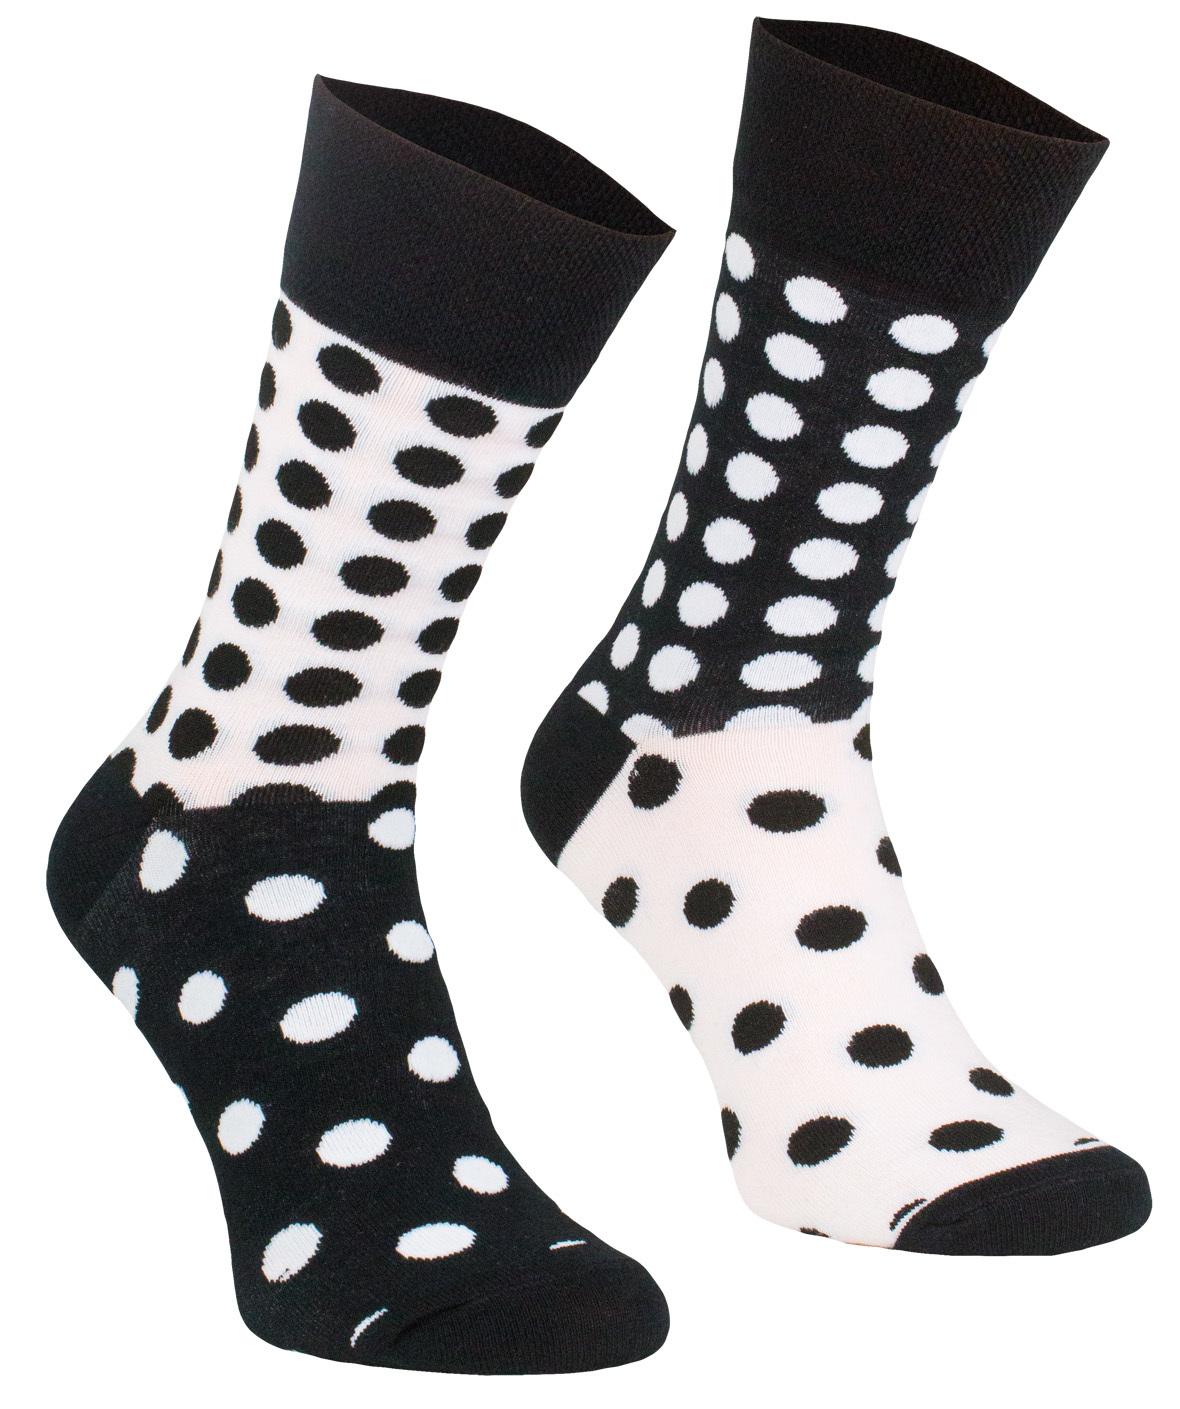 Grochy, Todo Socks, Czarno-białe, Kolorowe Skarpetki